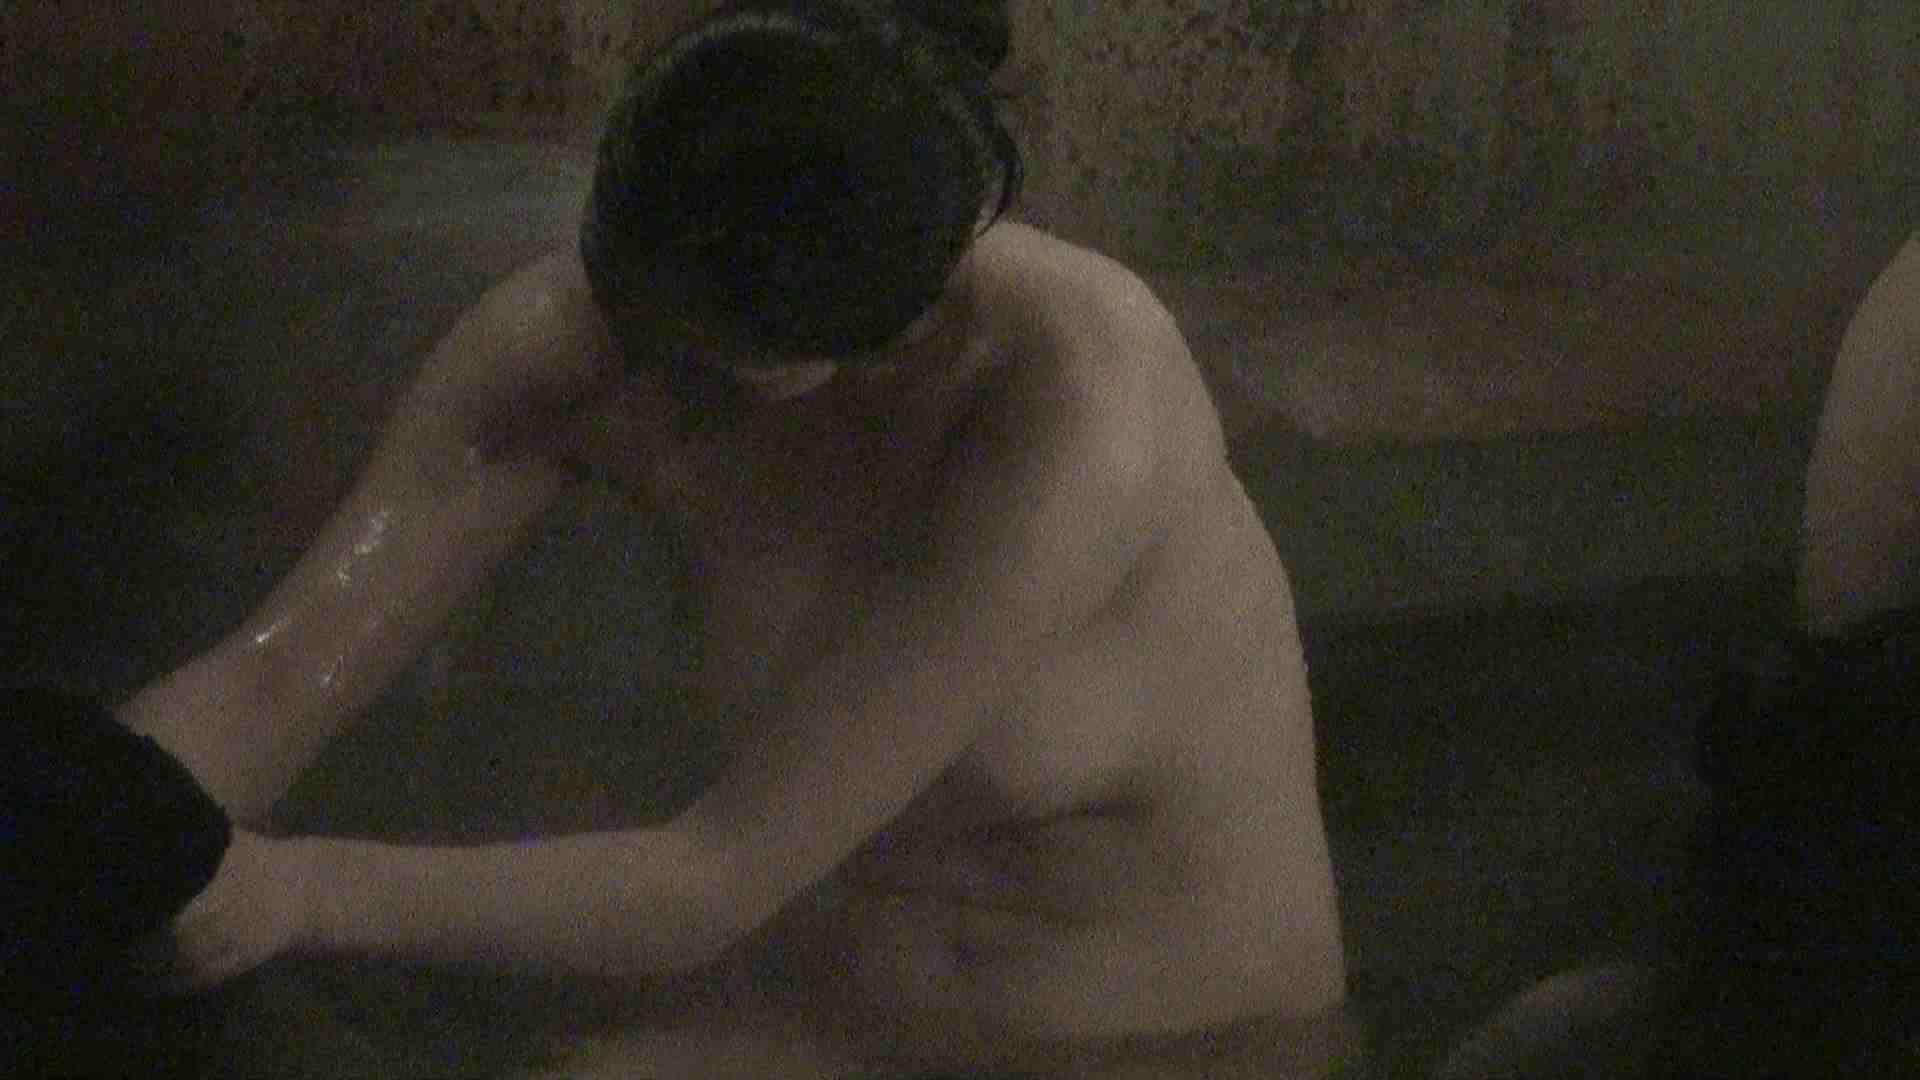 Aquaな露天風呂Vol.315 0 | 0  66連発 33